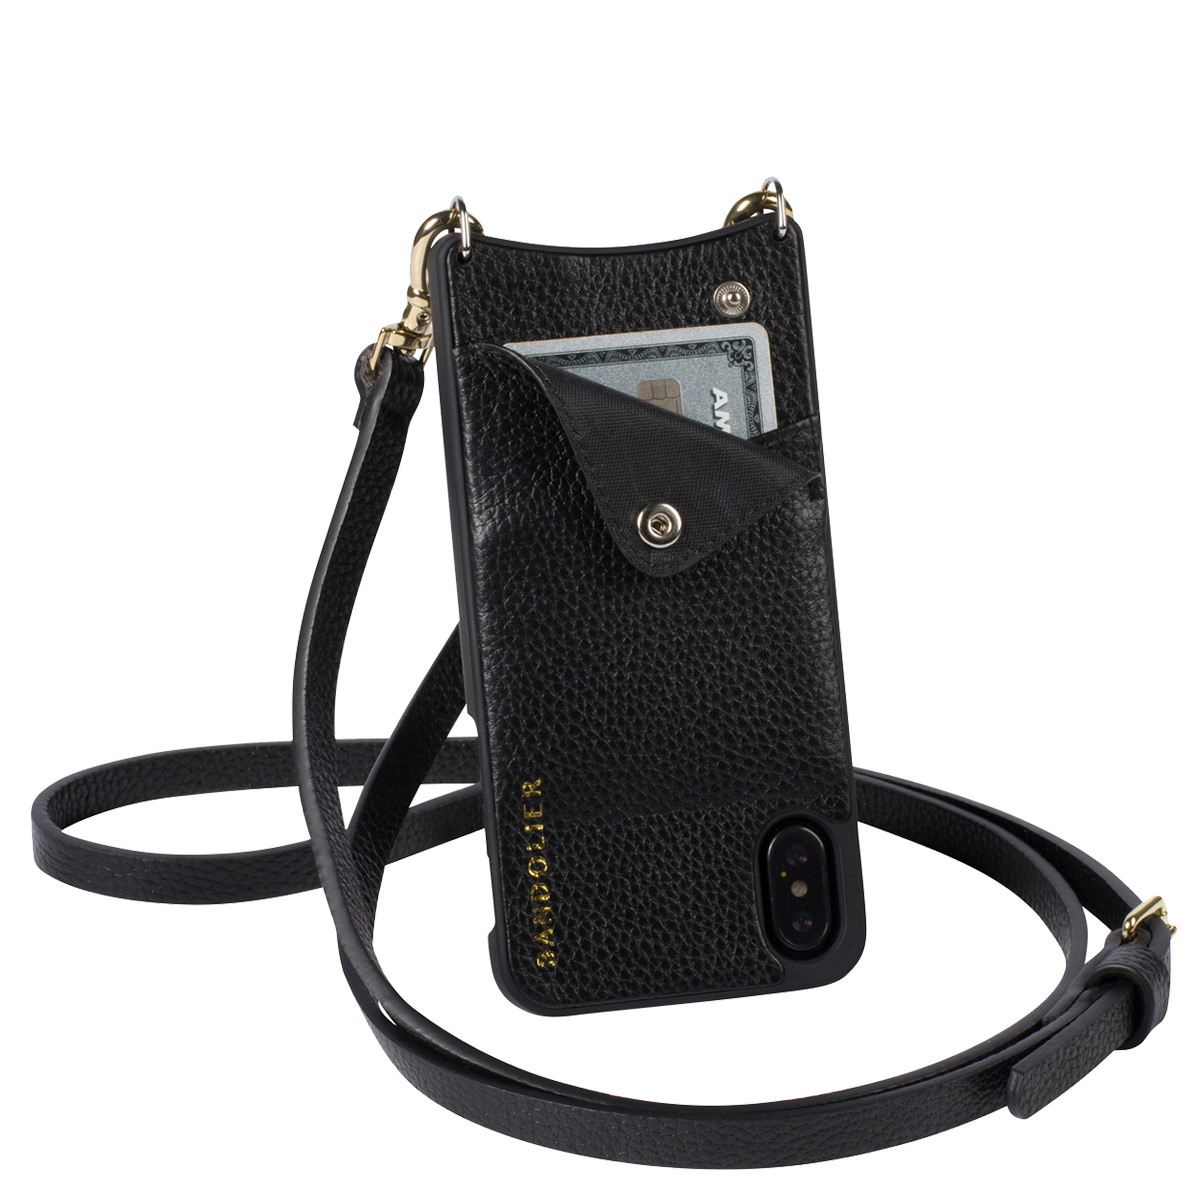 BANDOLIER iPhone XS MAX EMMA GOLD バンドリヤー ケース ショルダー スマホ アイフォン レザー メンズ レディース ブラック 10EMM1001